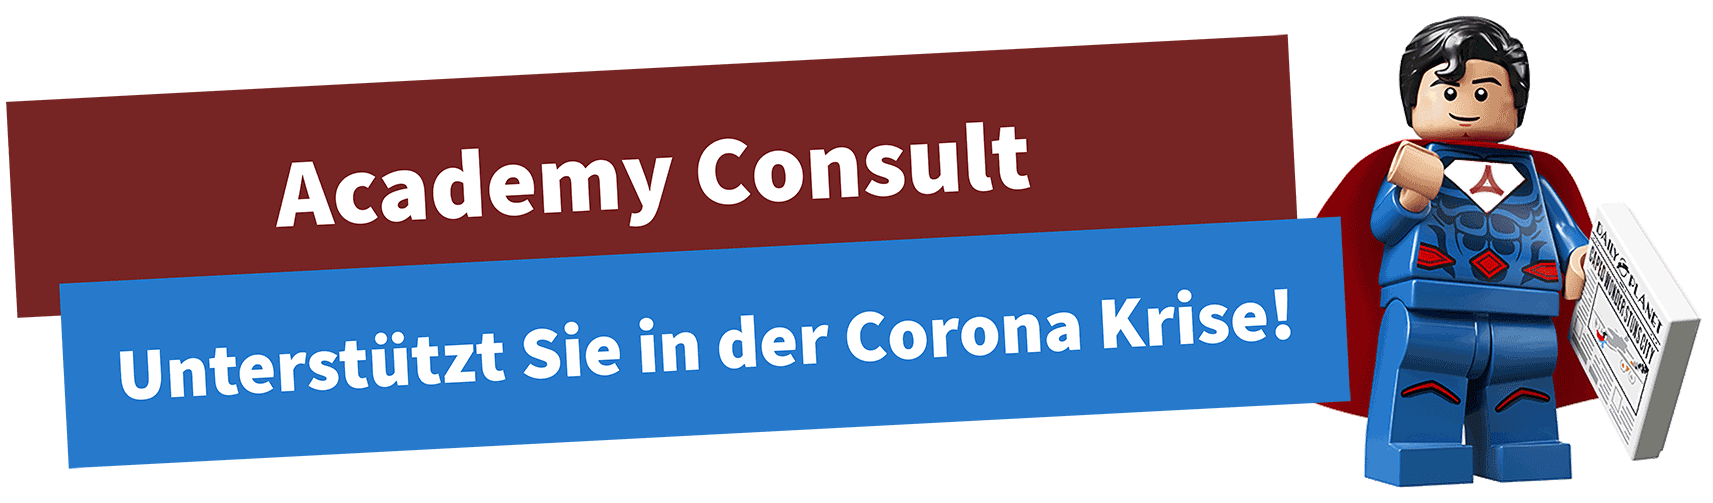 corona-krisenmanagement-academy-consult-4